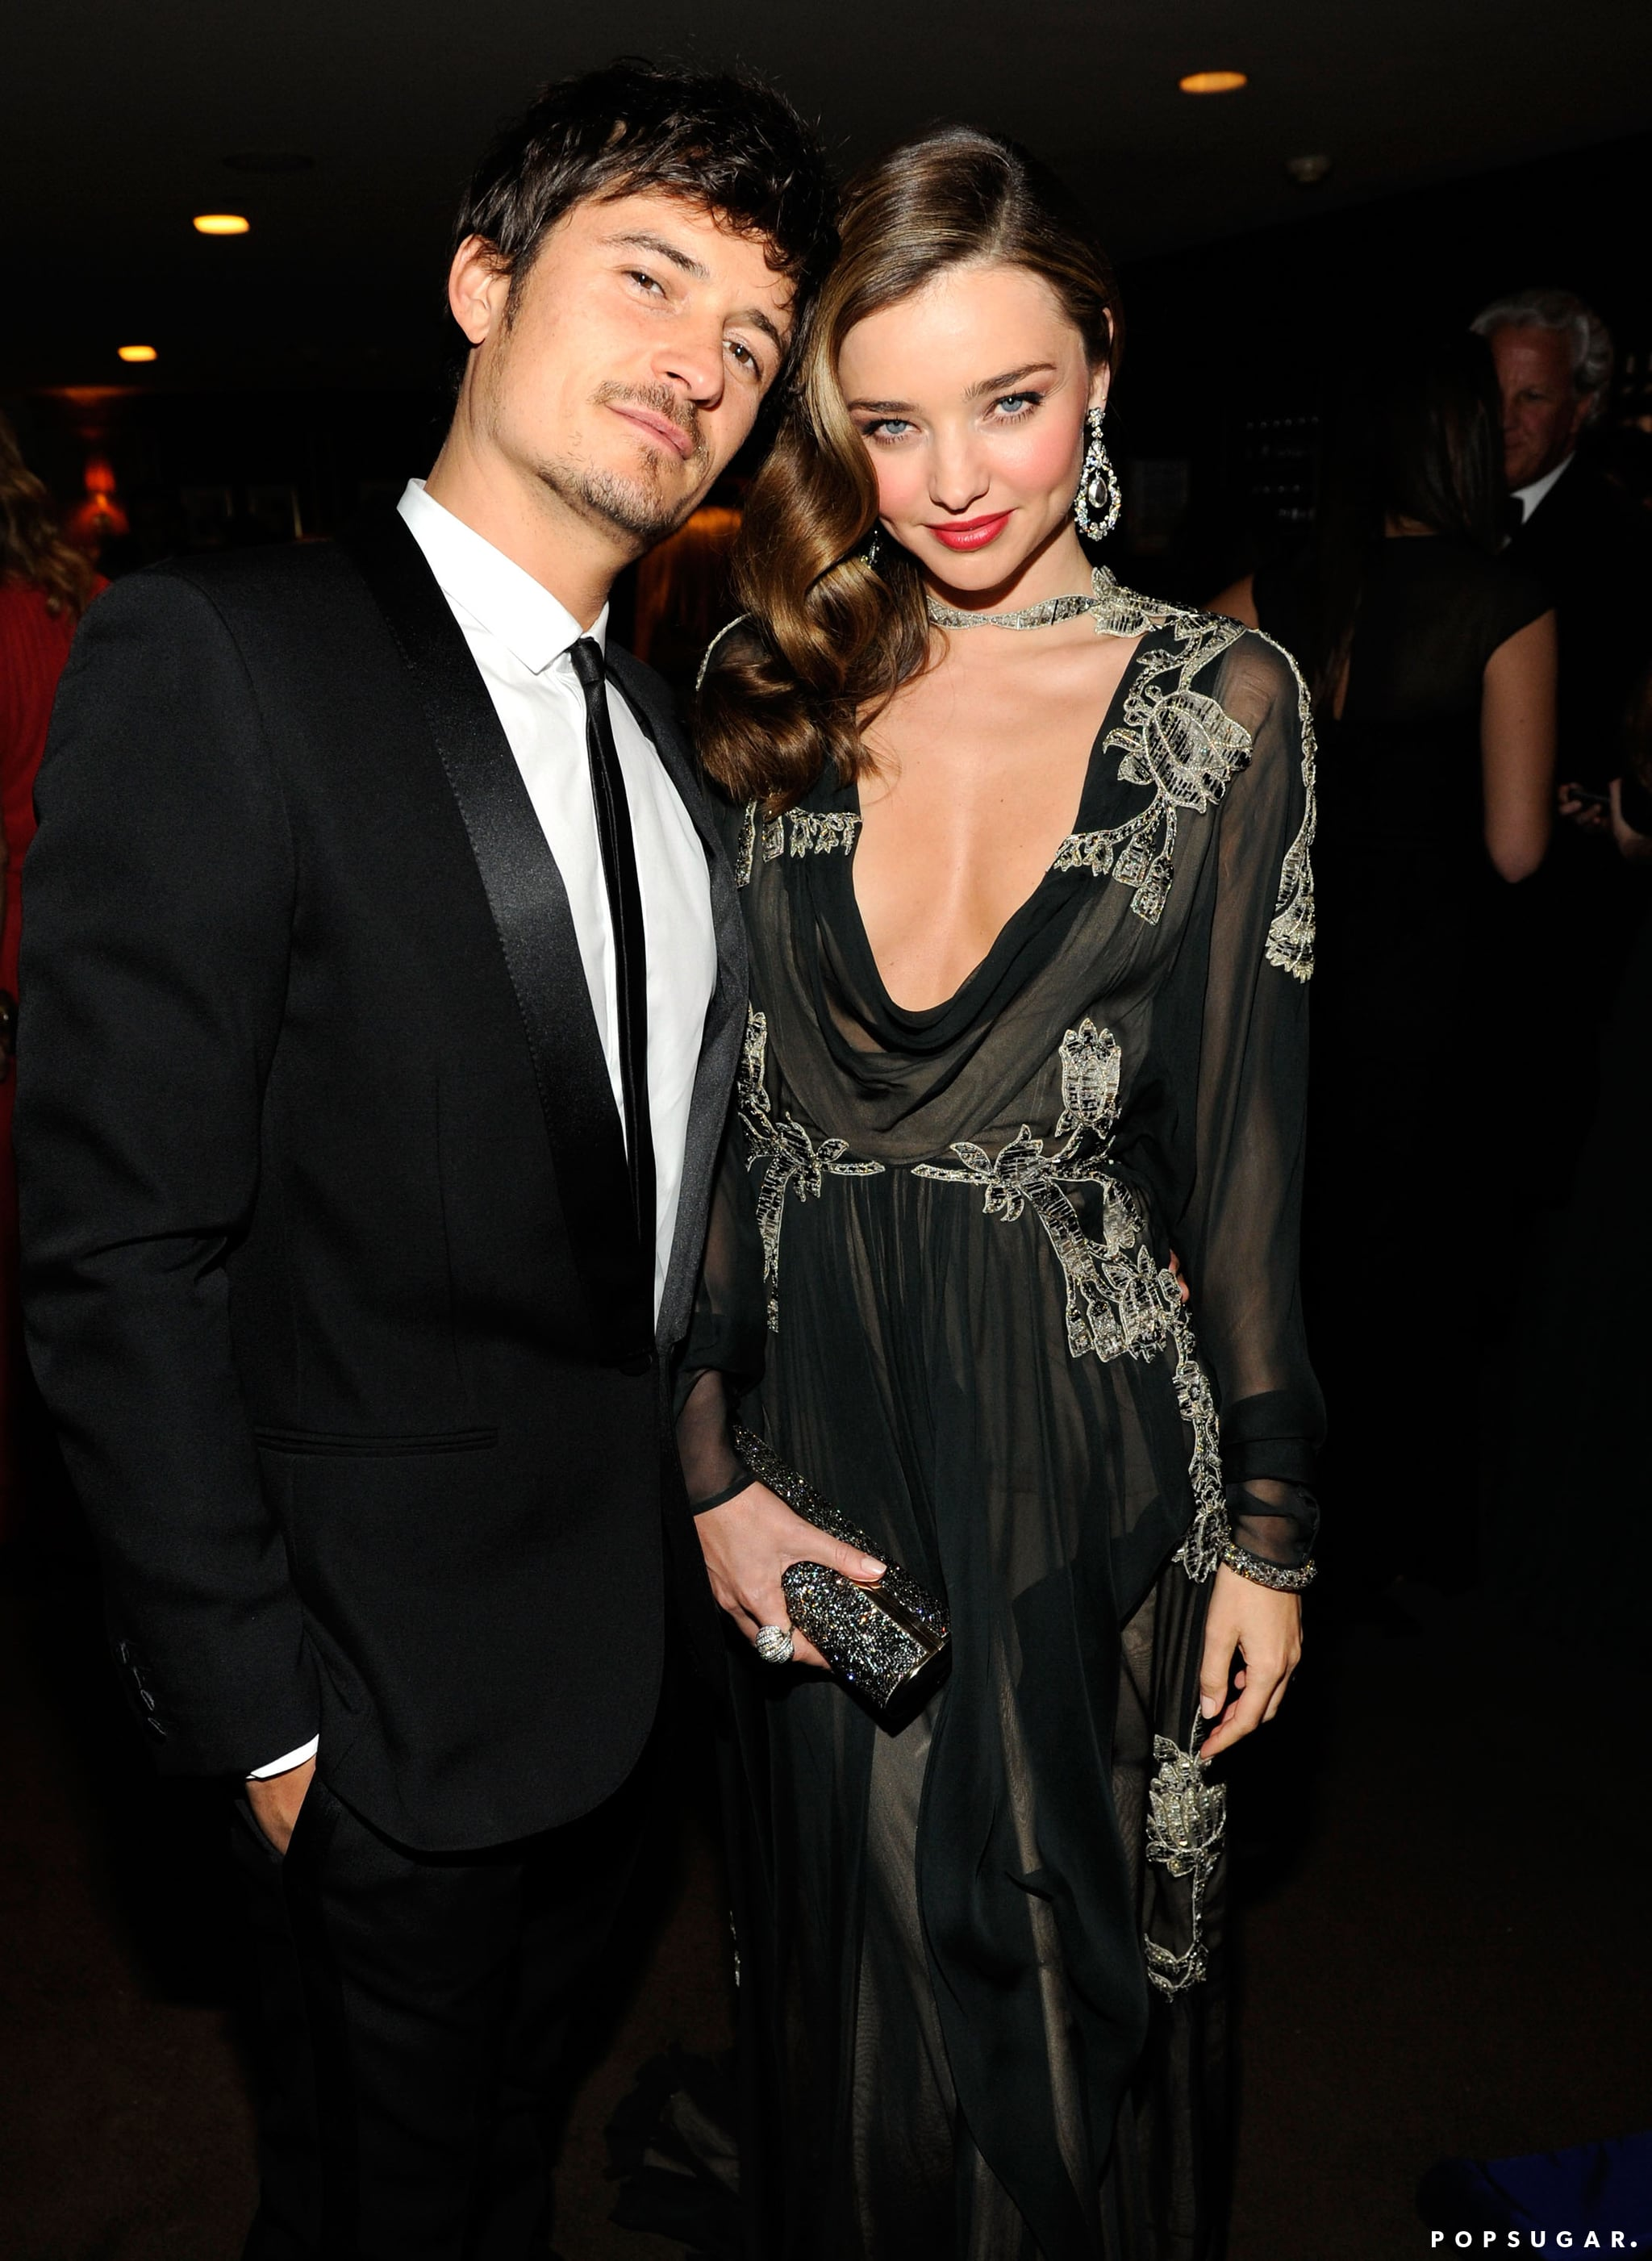 Orlando Bloom and Miranda Kerr attended the Vanity Fair party on Sunday night.